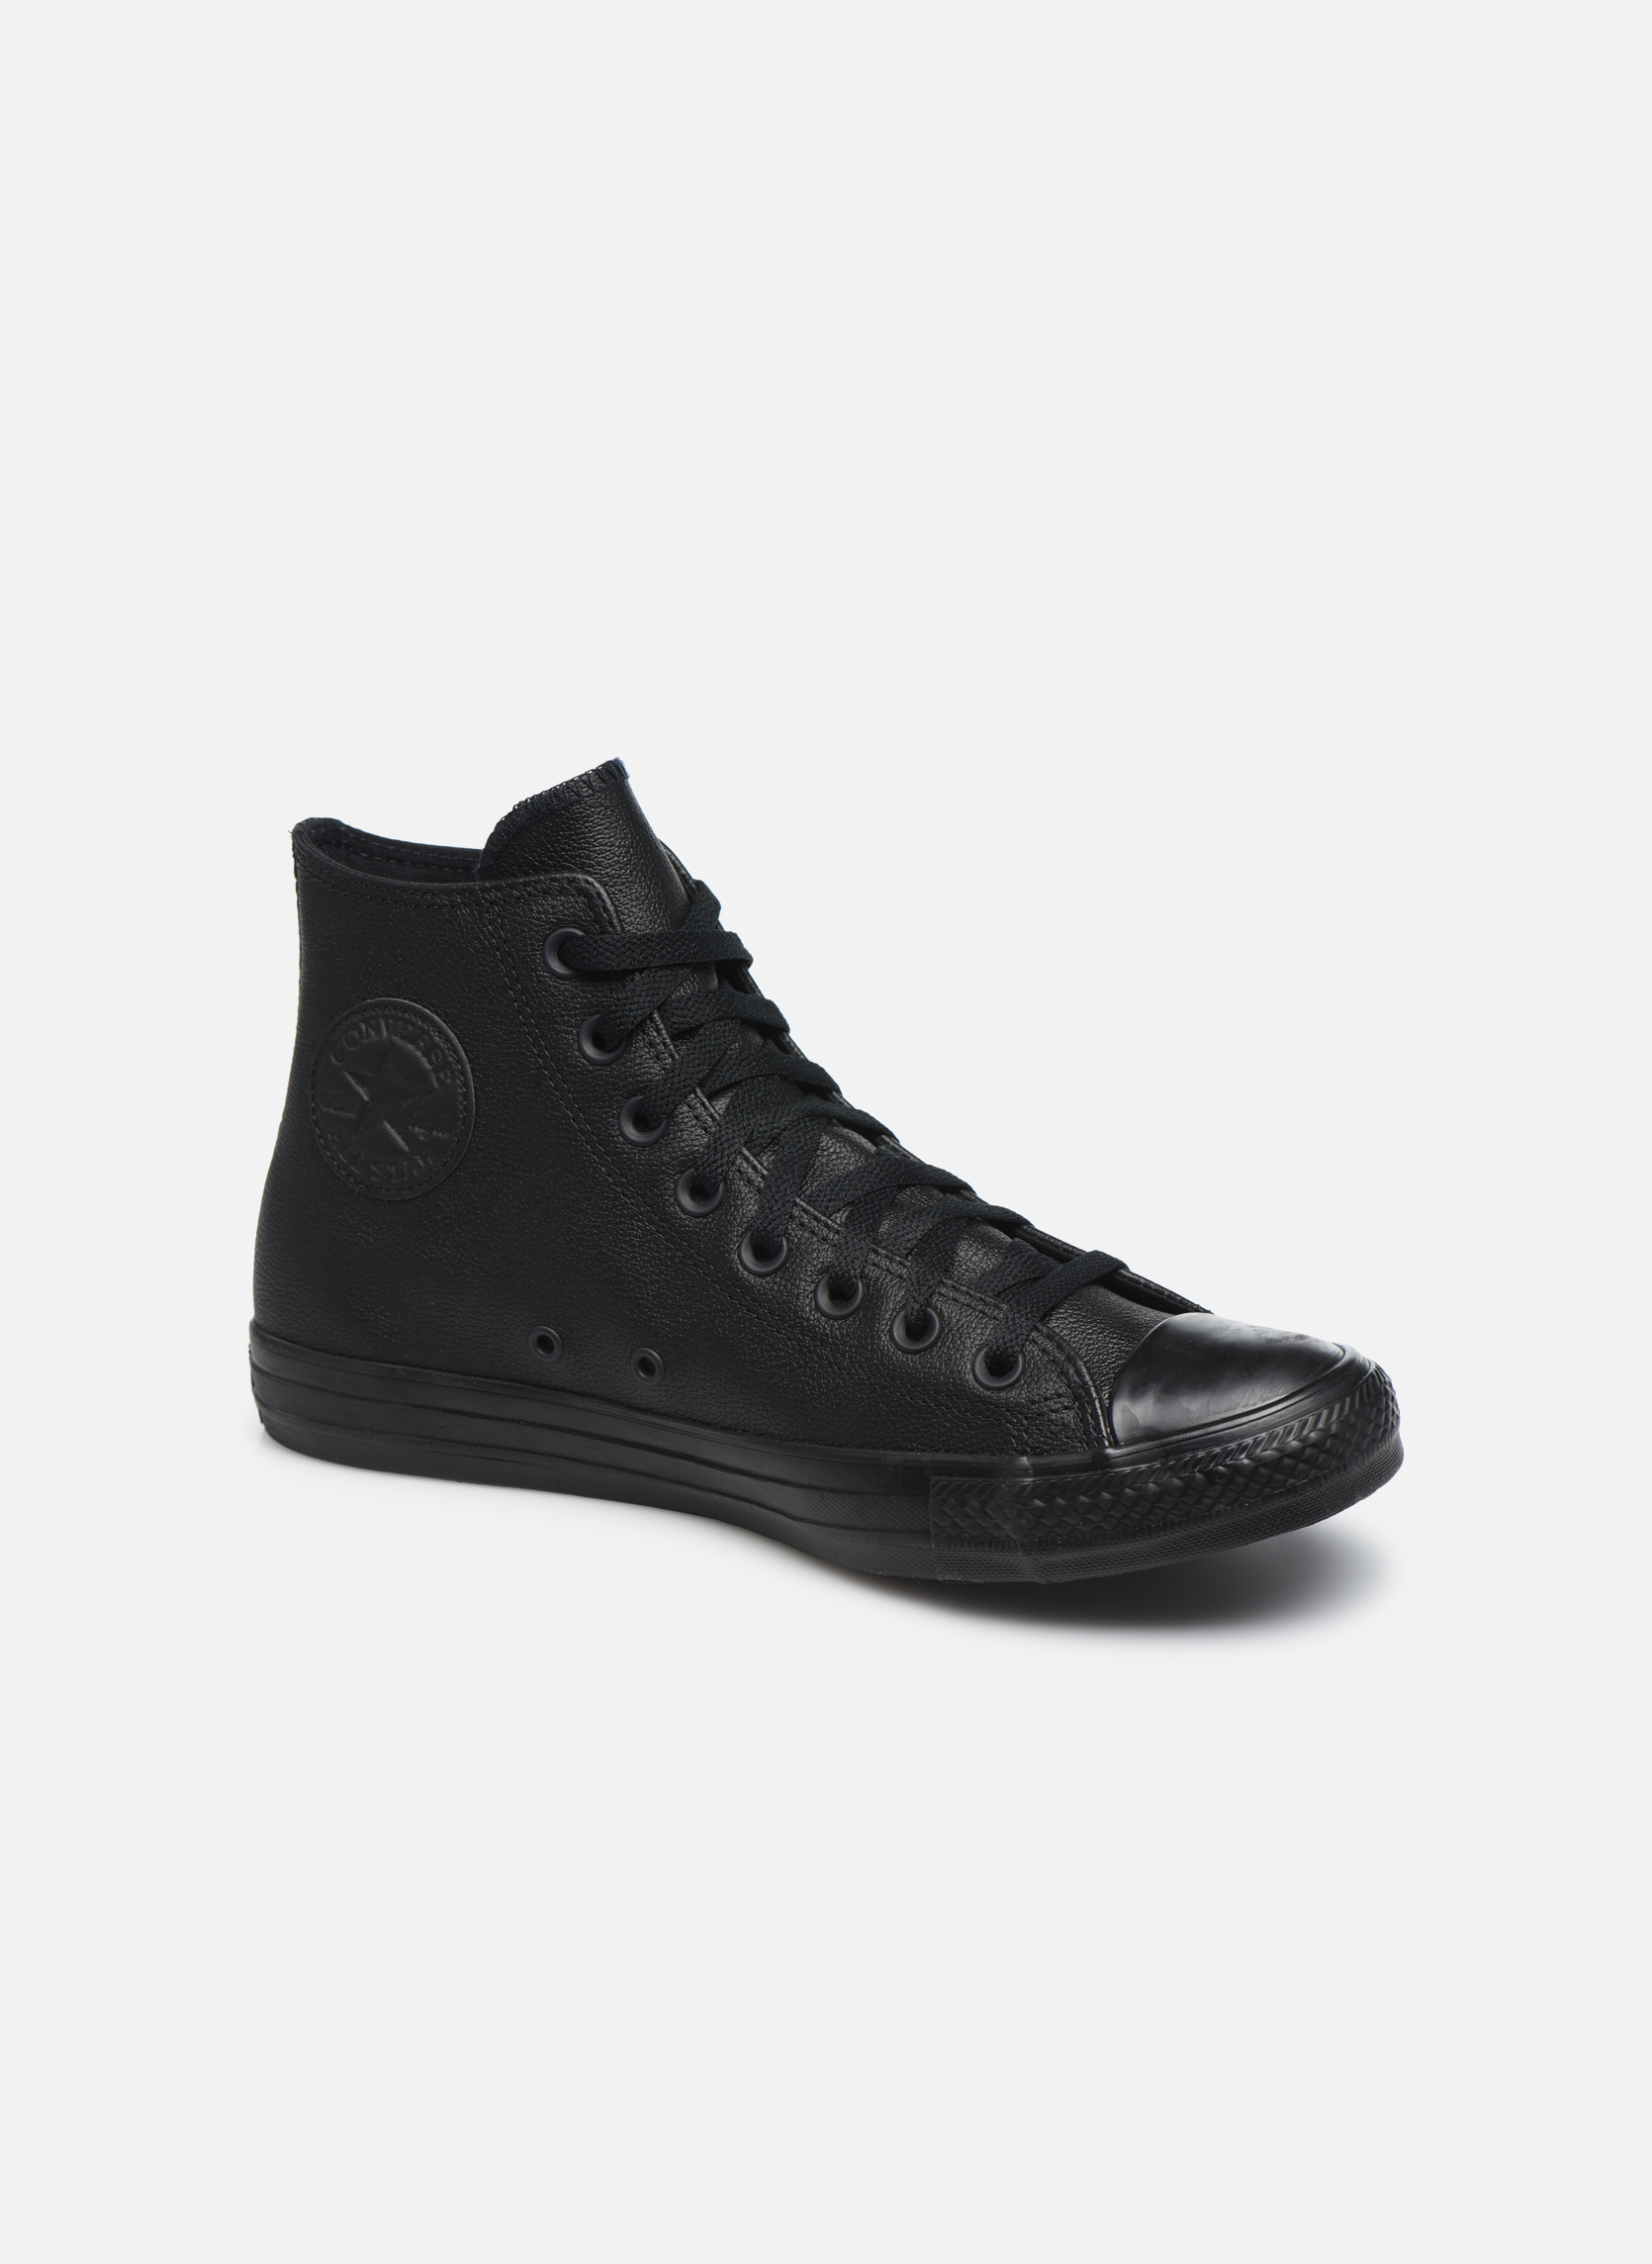 Sneakers Converse Chuck Taylor All Star Mono Leather Hi M Zwart detail